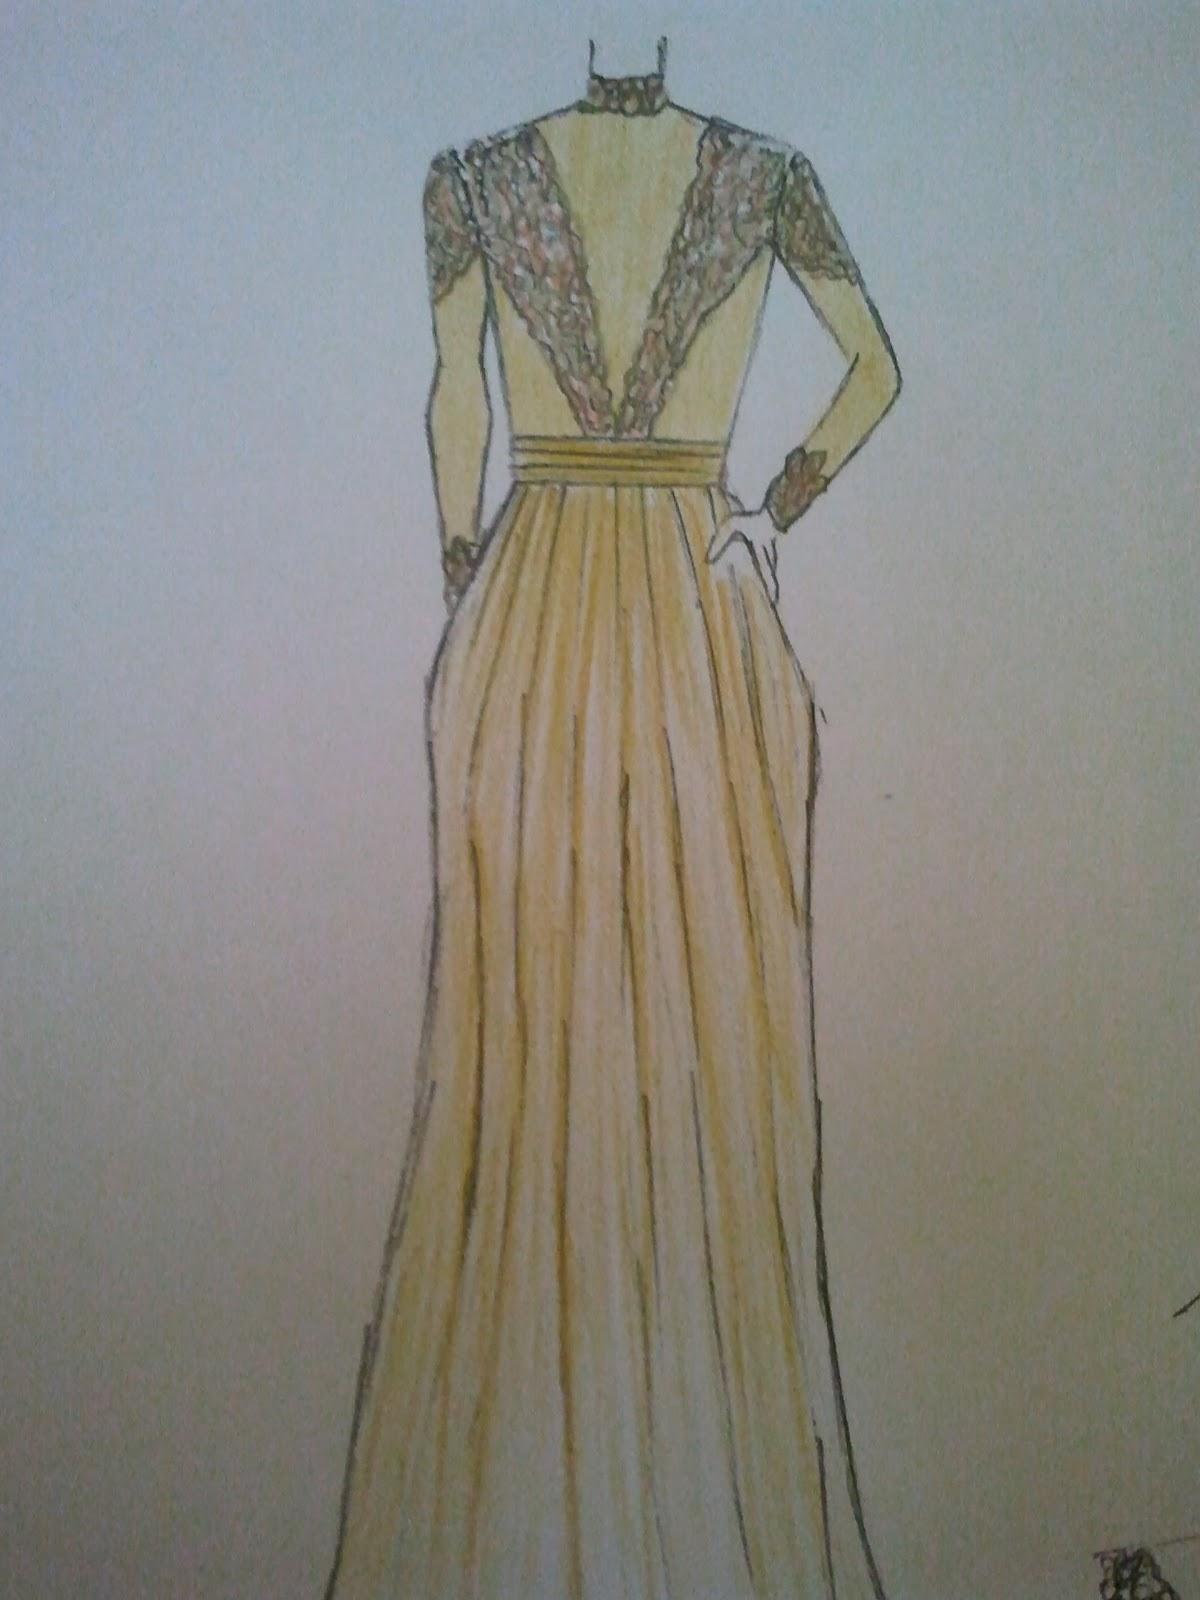 Desain Gaun Kebaya Plunging Neckline